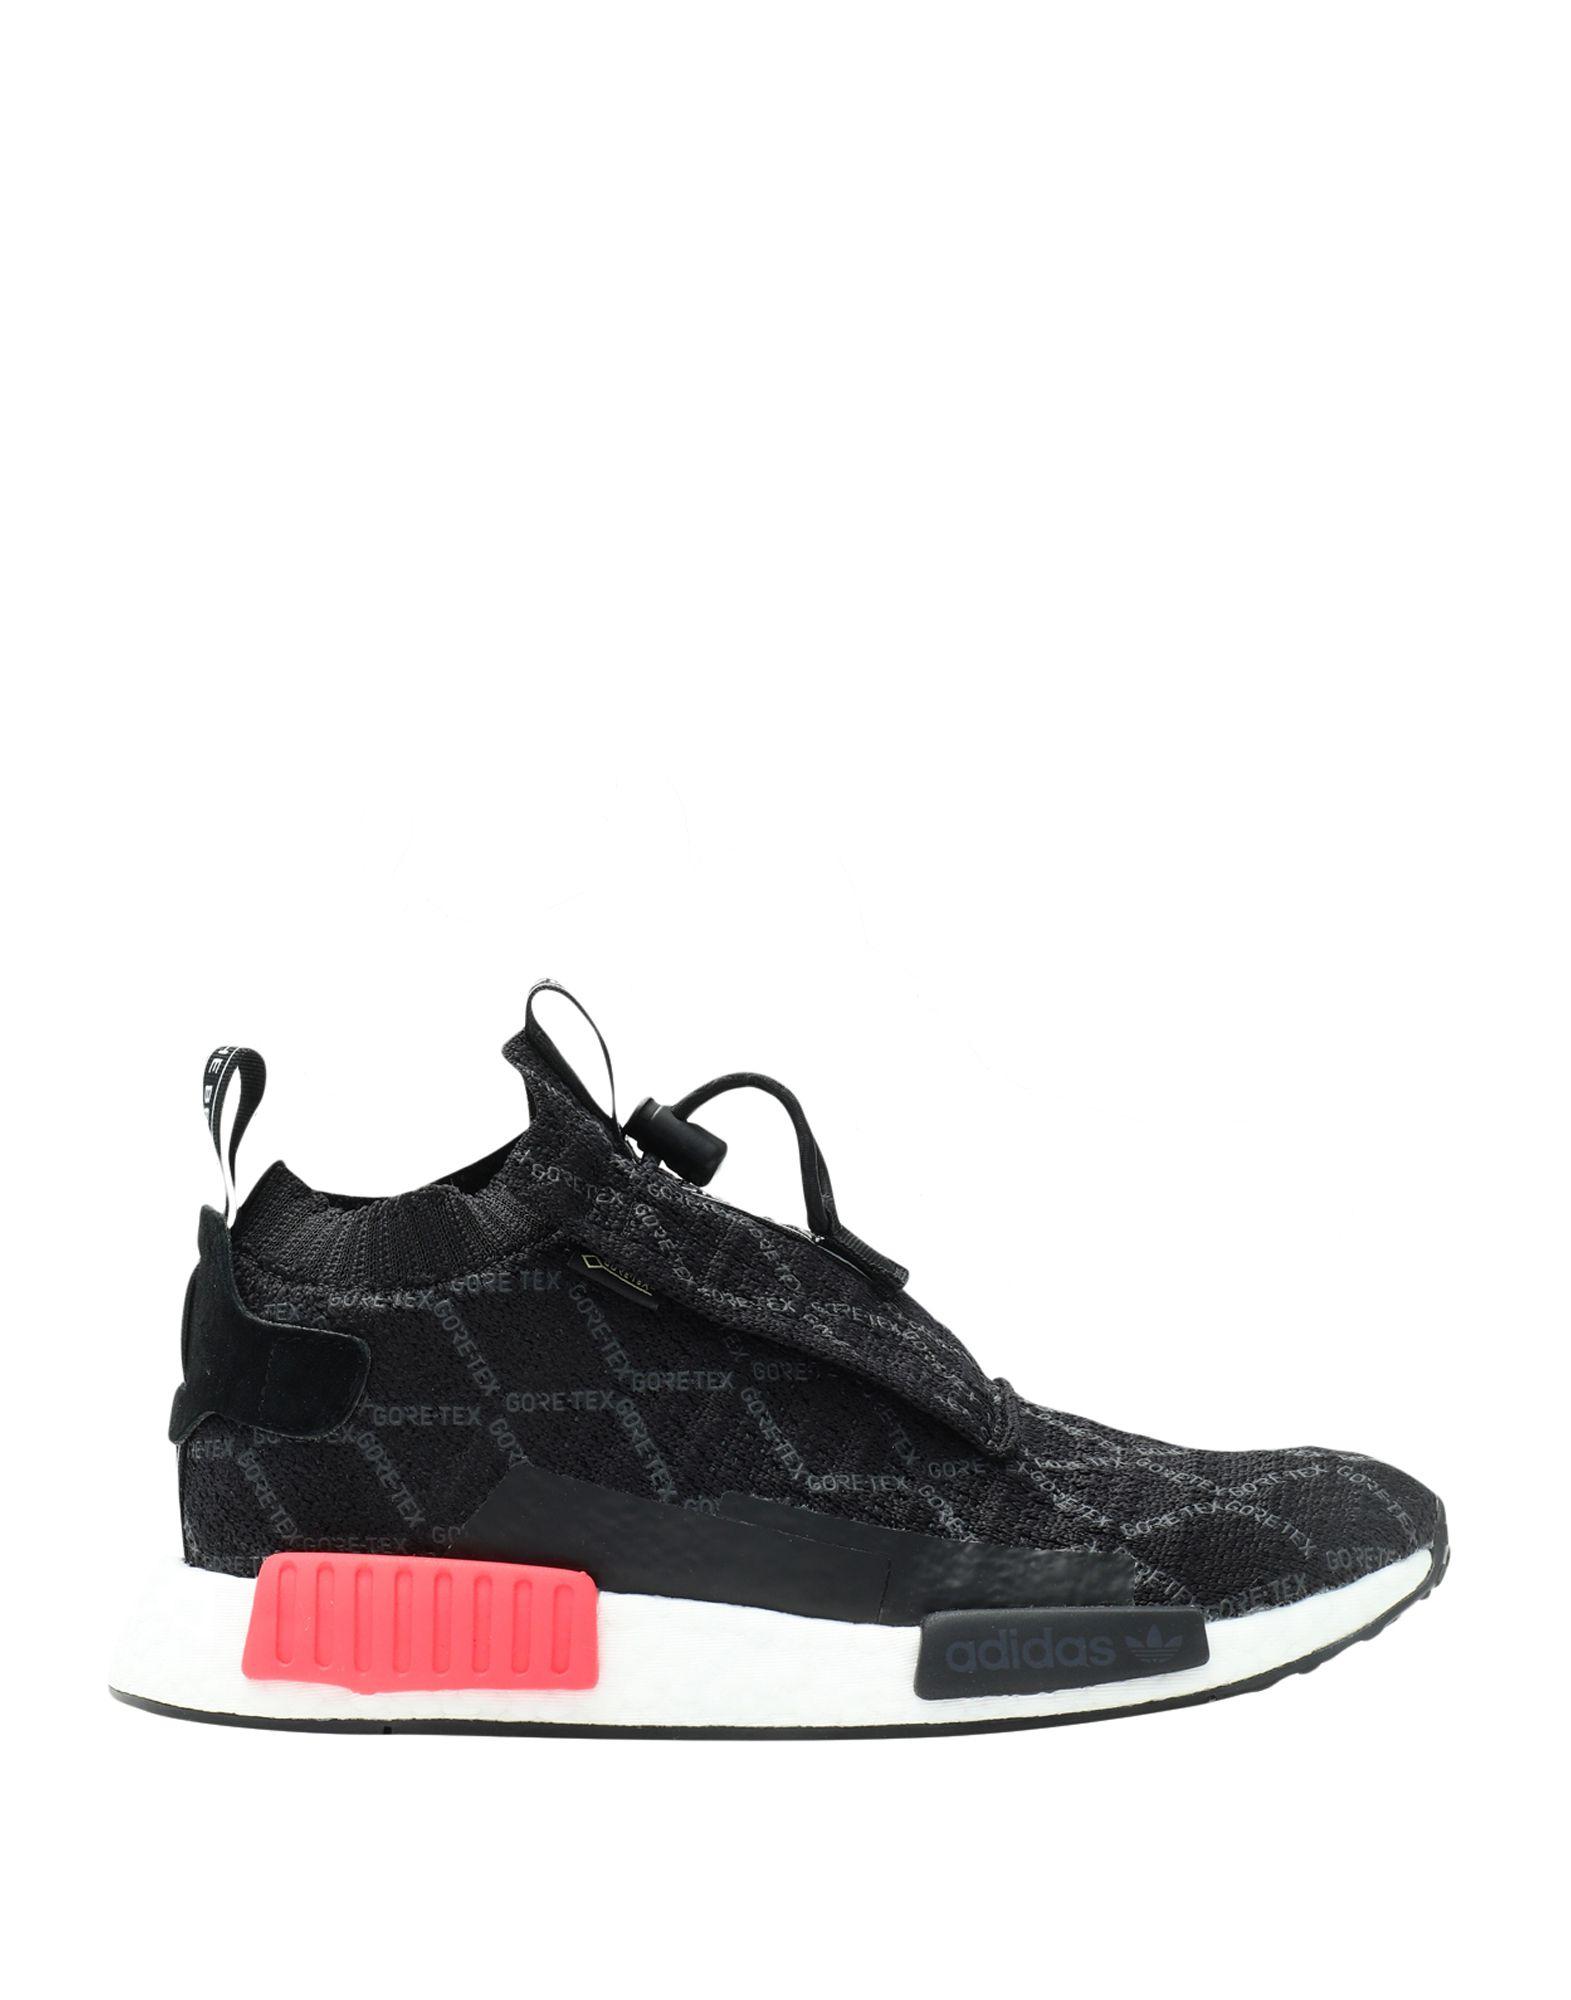 Baskets Adidas Originals Nmd_Ts1 Pk Gtx - Homme - baskets Adidas Originals   - 11644766OP